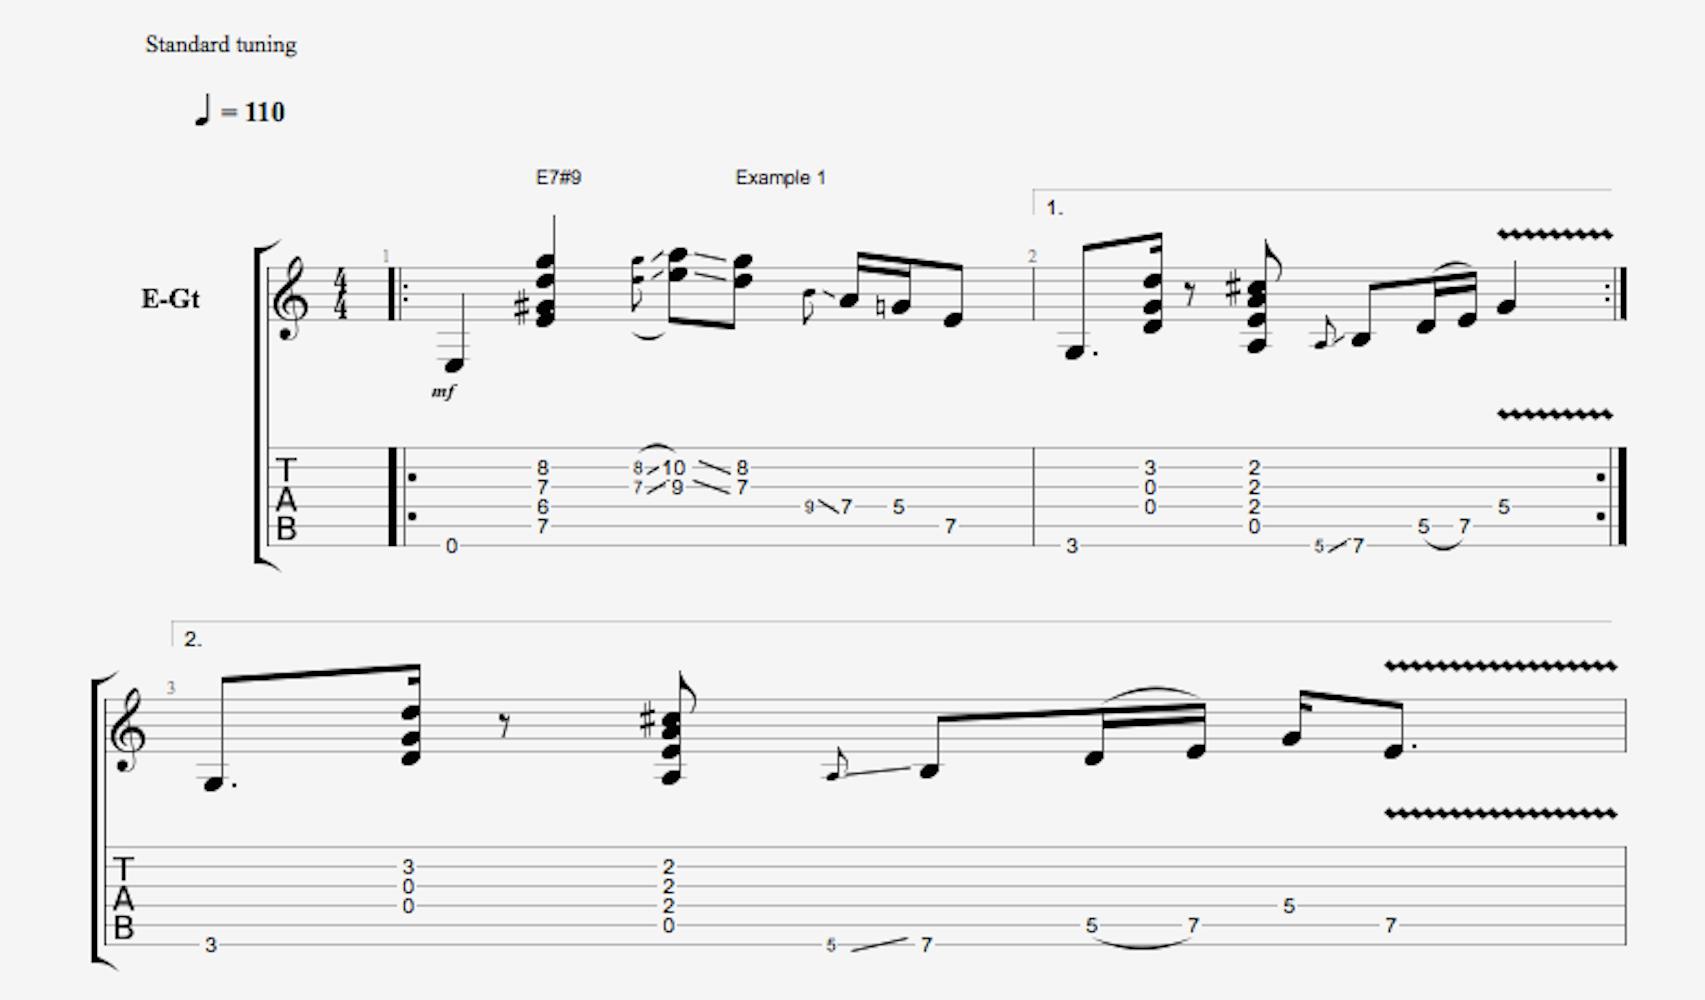 Play Like Jimi Hendrix Fundamental Changes Music Book Publishing